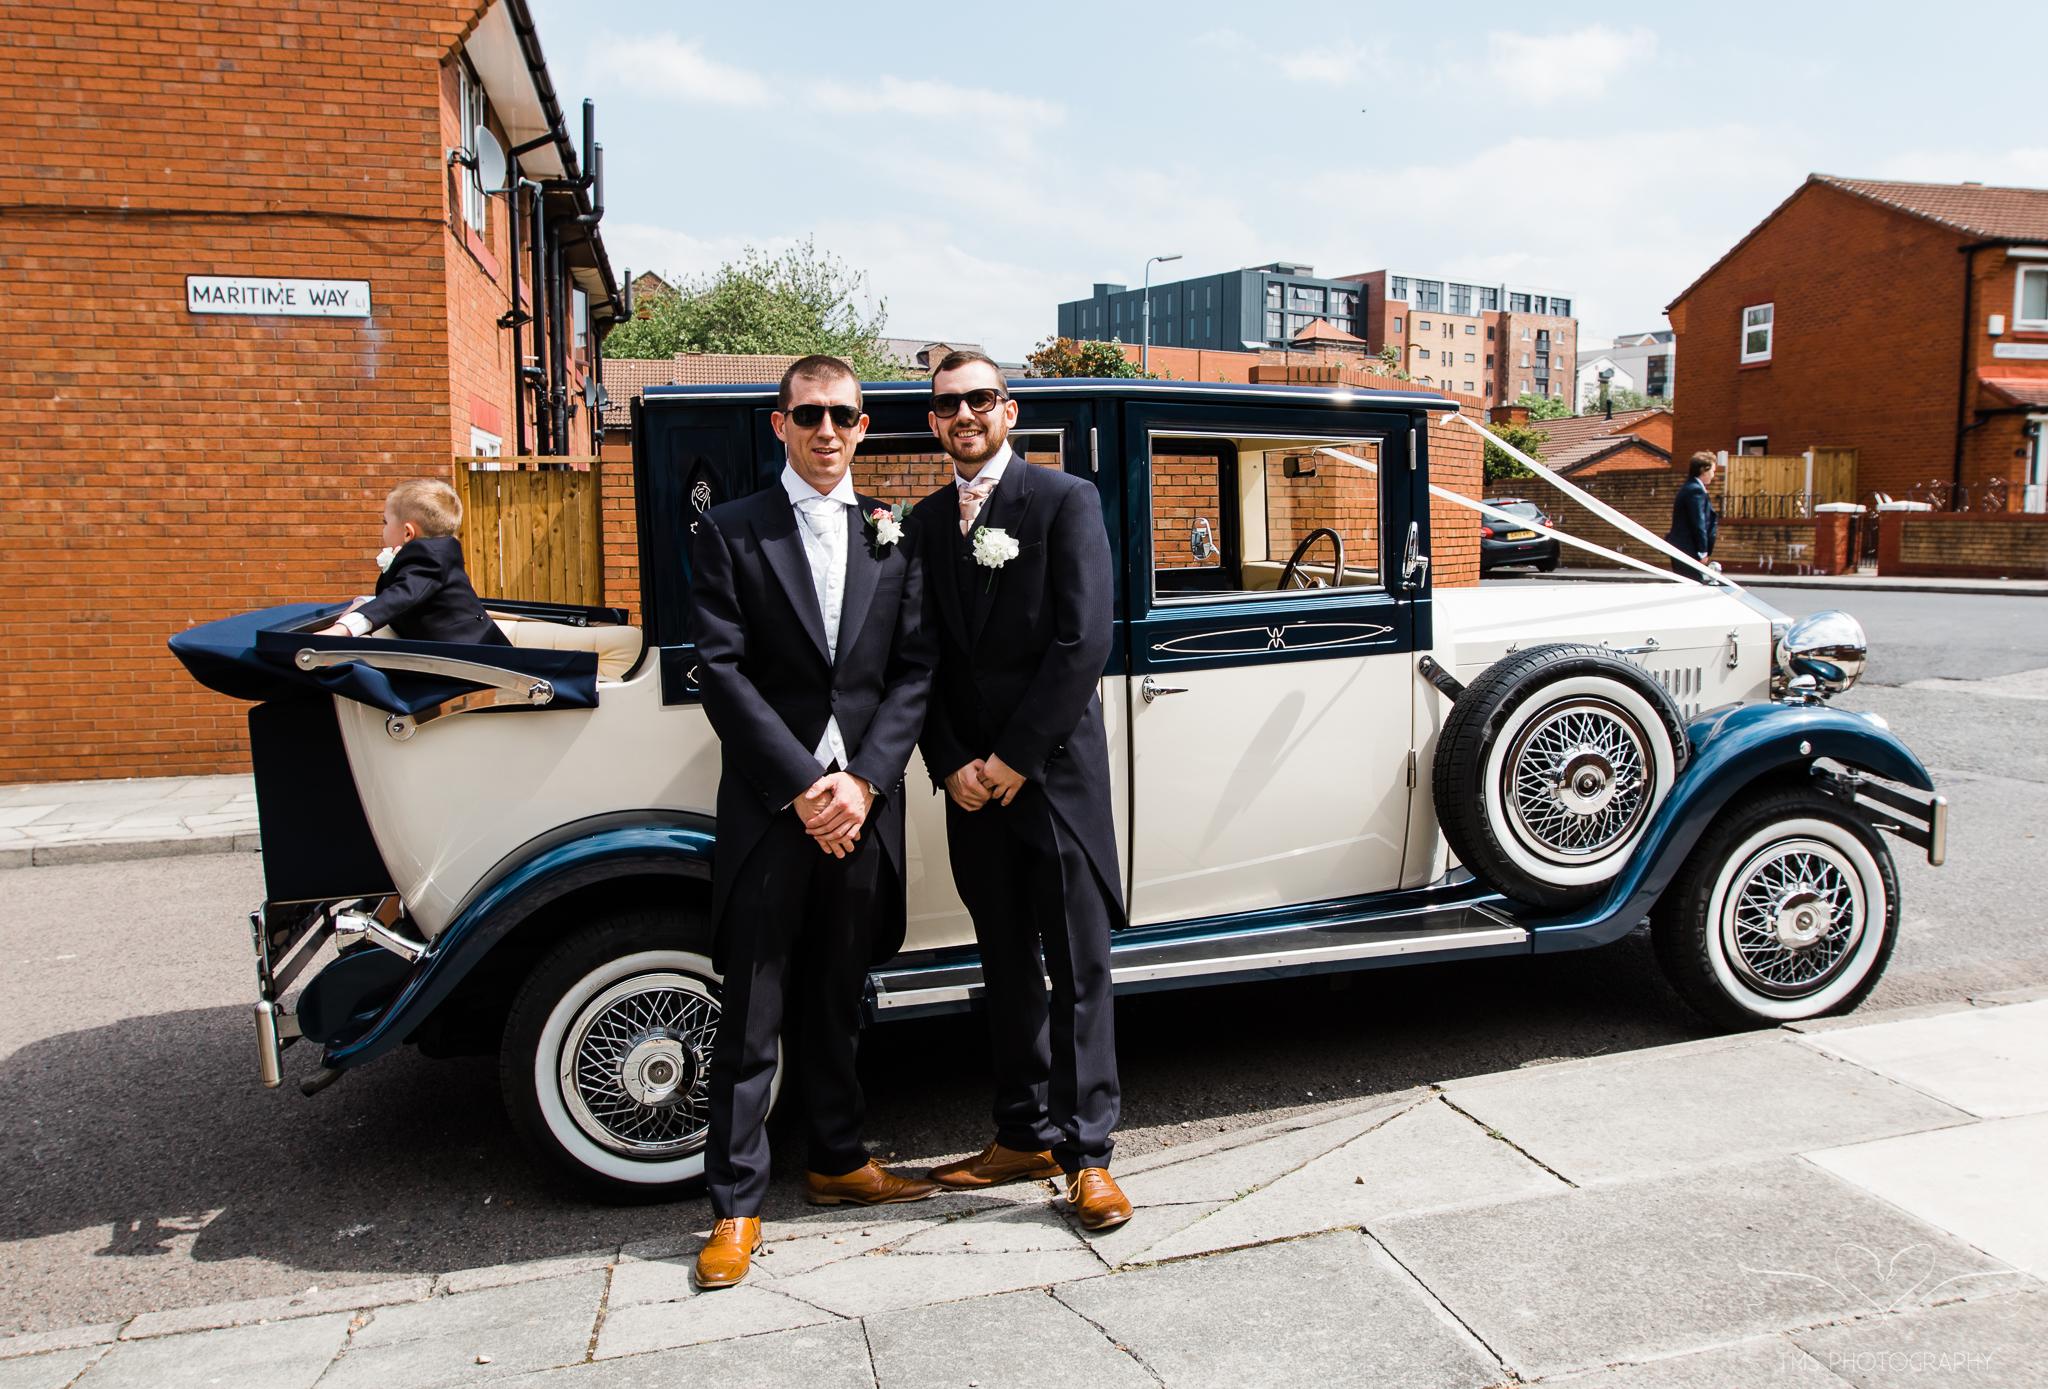 Wedding_photography_Hilton_liverpool_Albertdocks-46